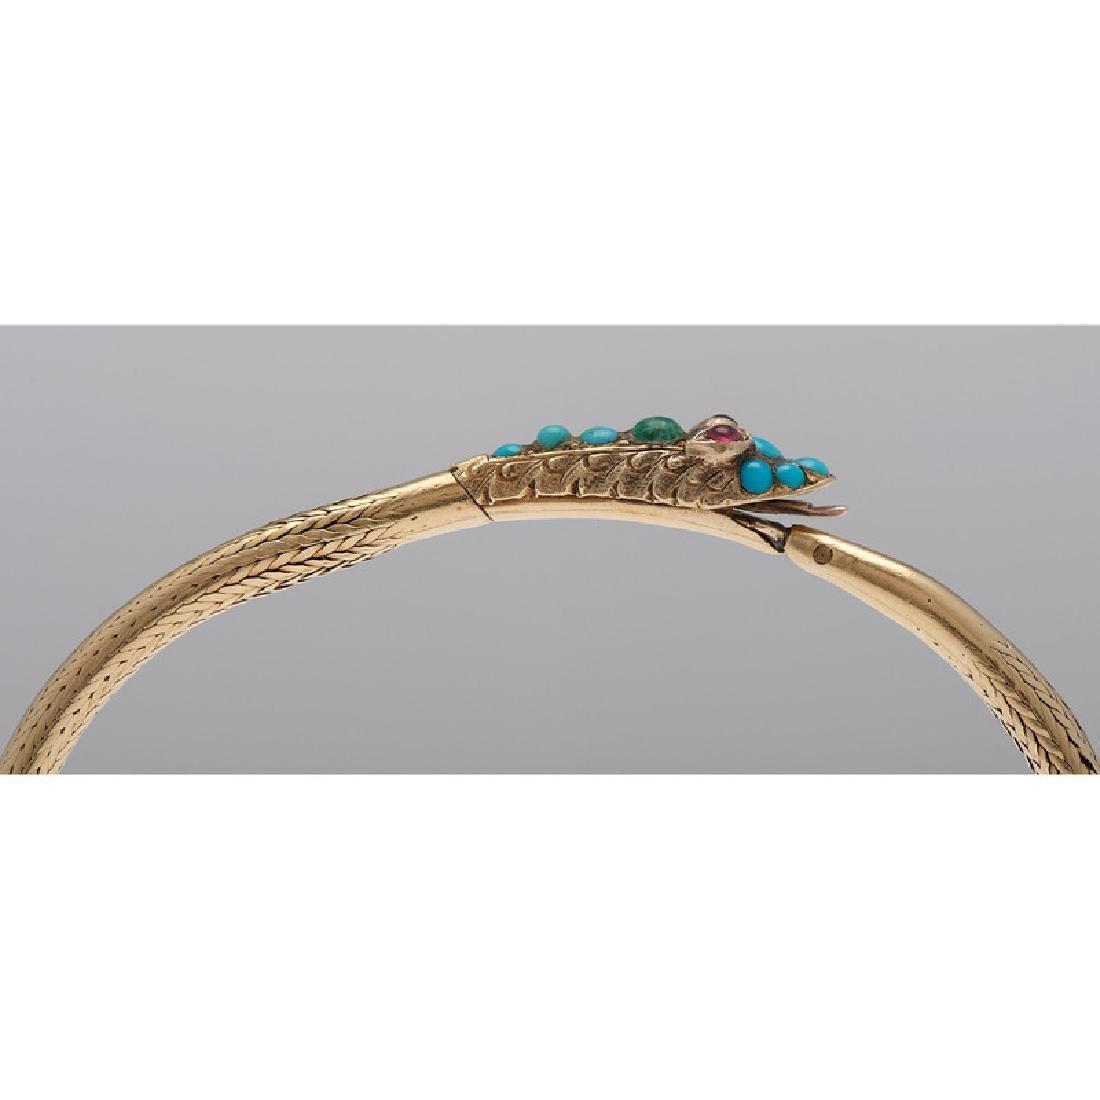 18 Karat Yellow Gold Victorian Serpent Snake Bracelet - 2